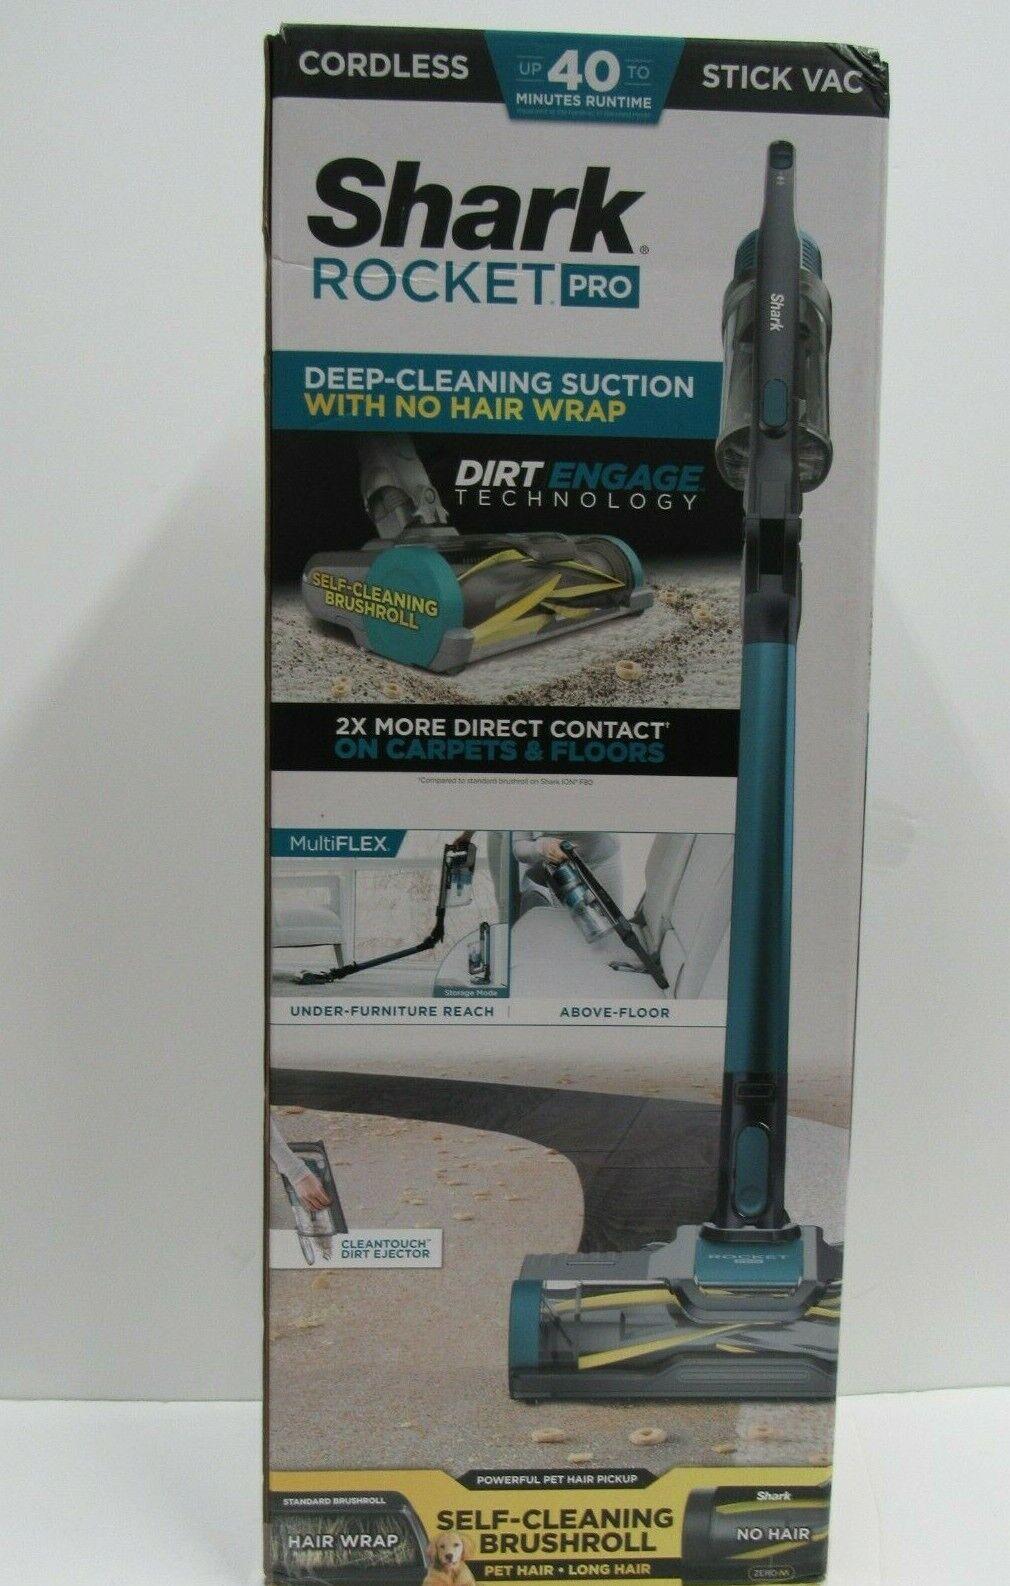 NEW Shark Rocket Pro Cordless Stick Vac Vacuum IZ140 blue FA